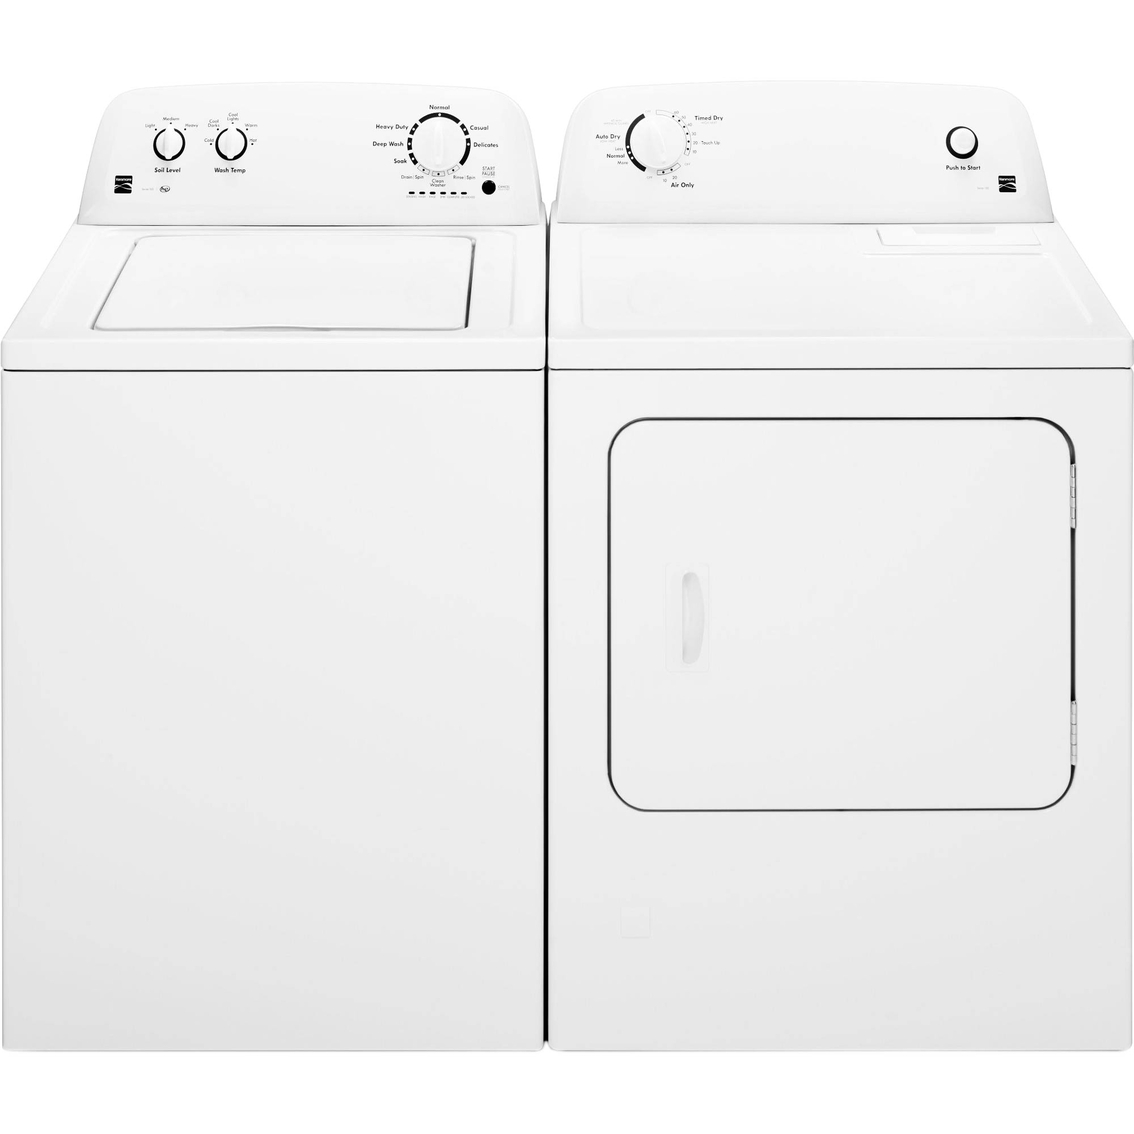 kenmore washer and dryer. 3550 kenmore washer and dryer